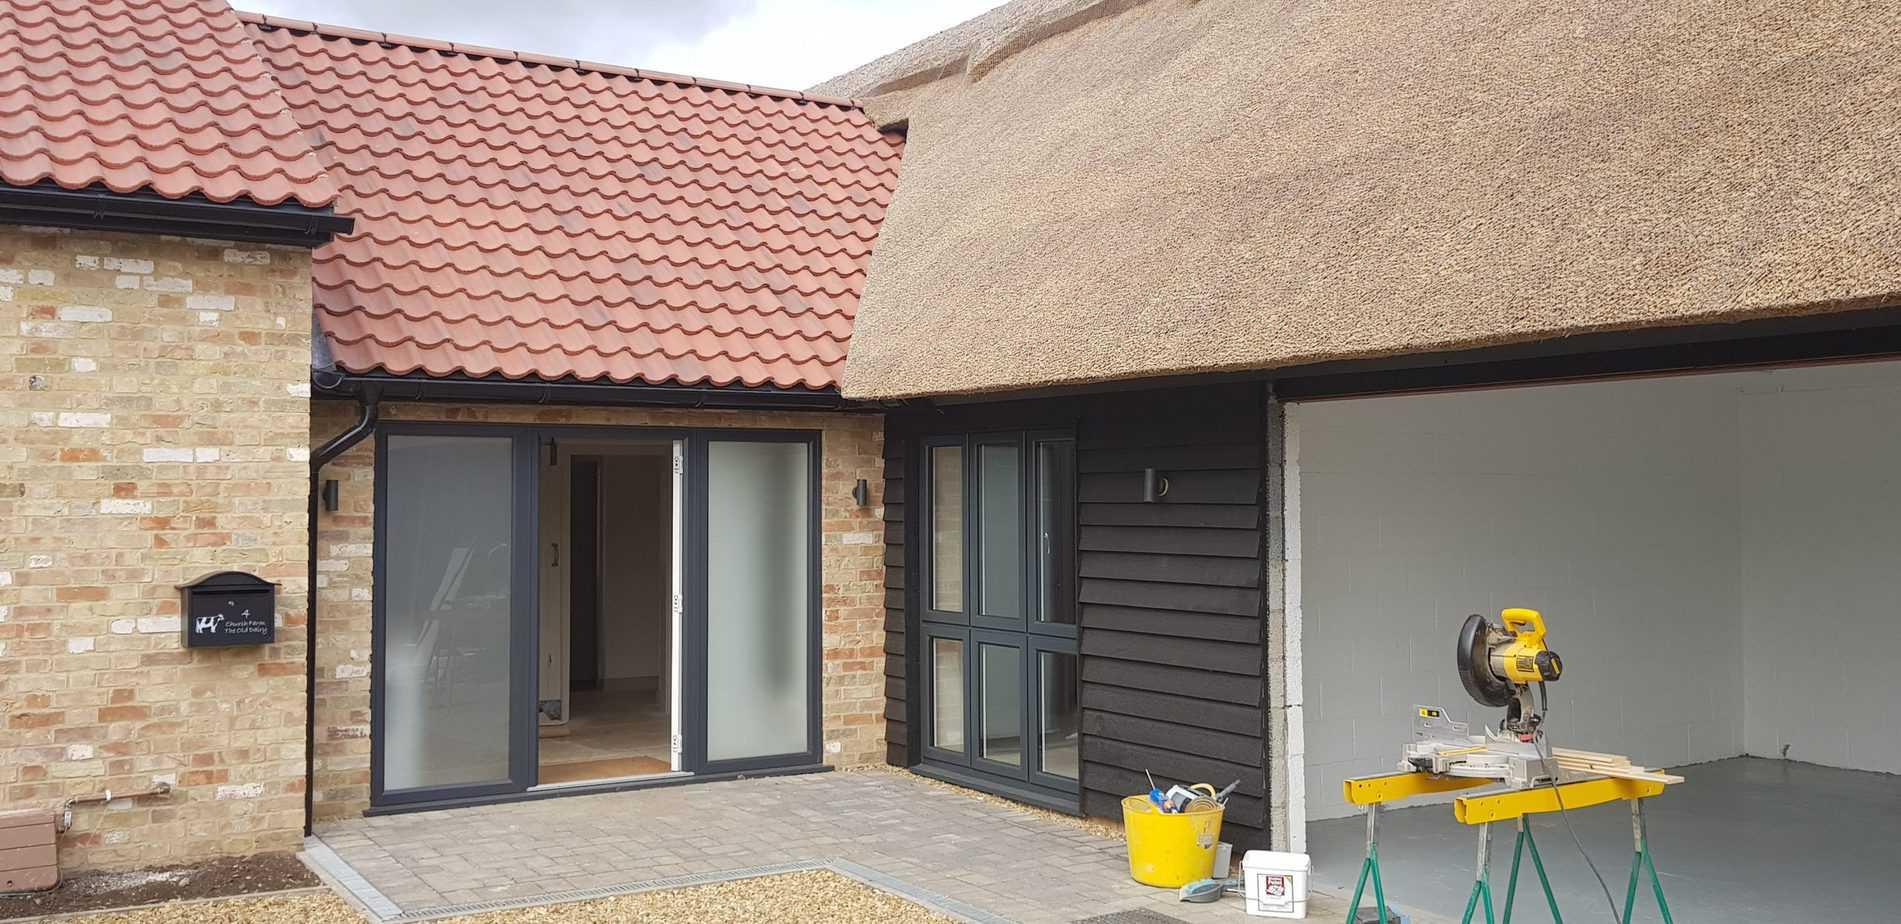 upward-barn conversions-traditional build-plot1-10-min